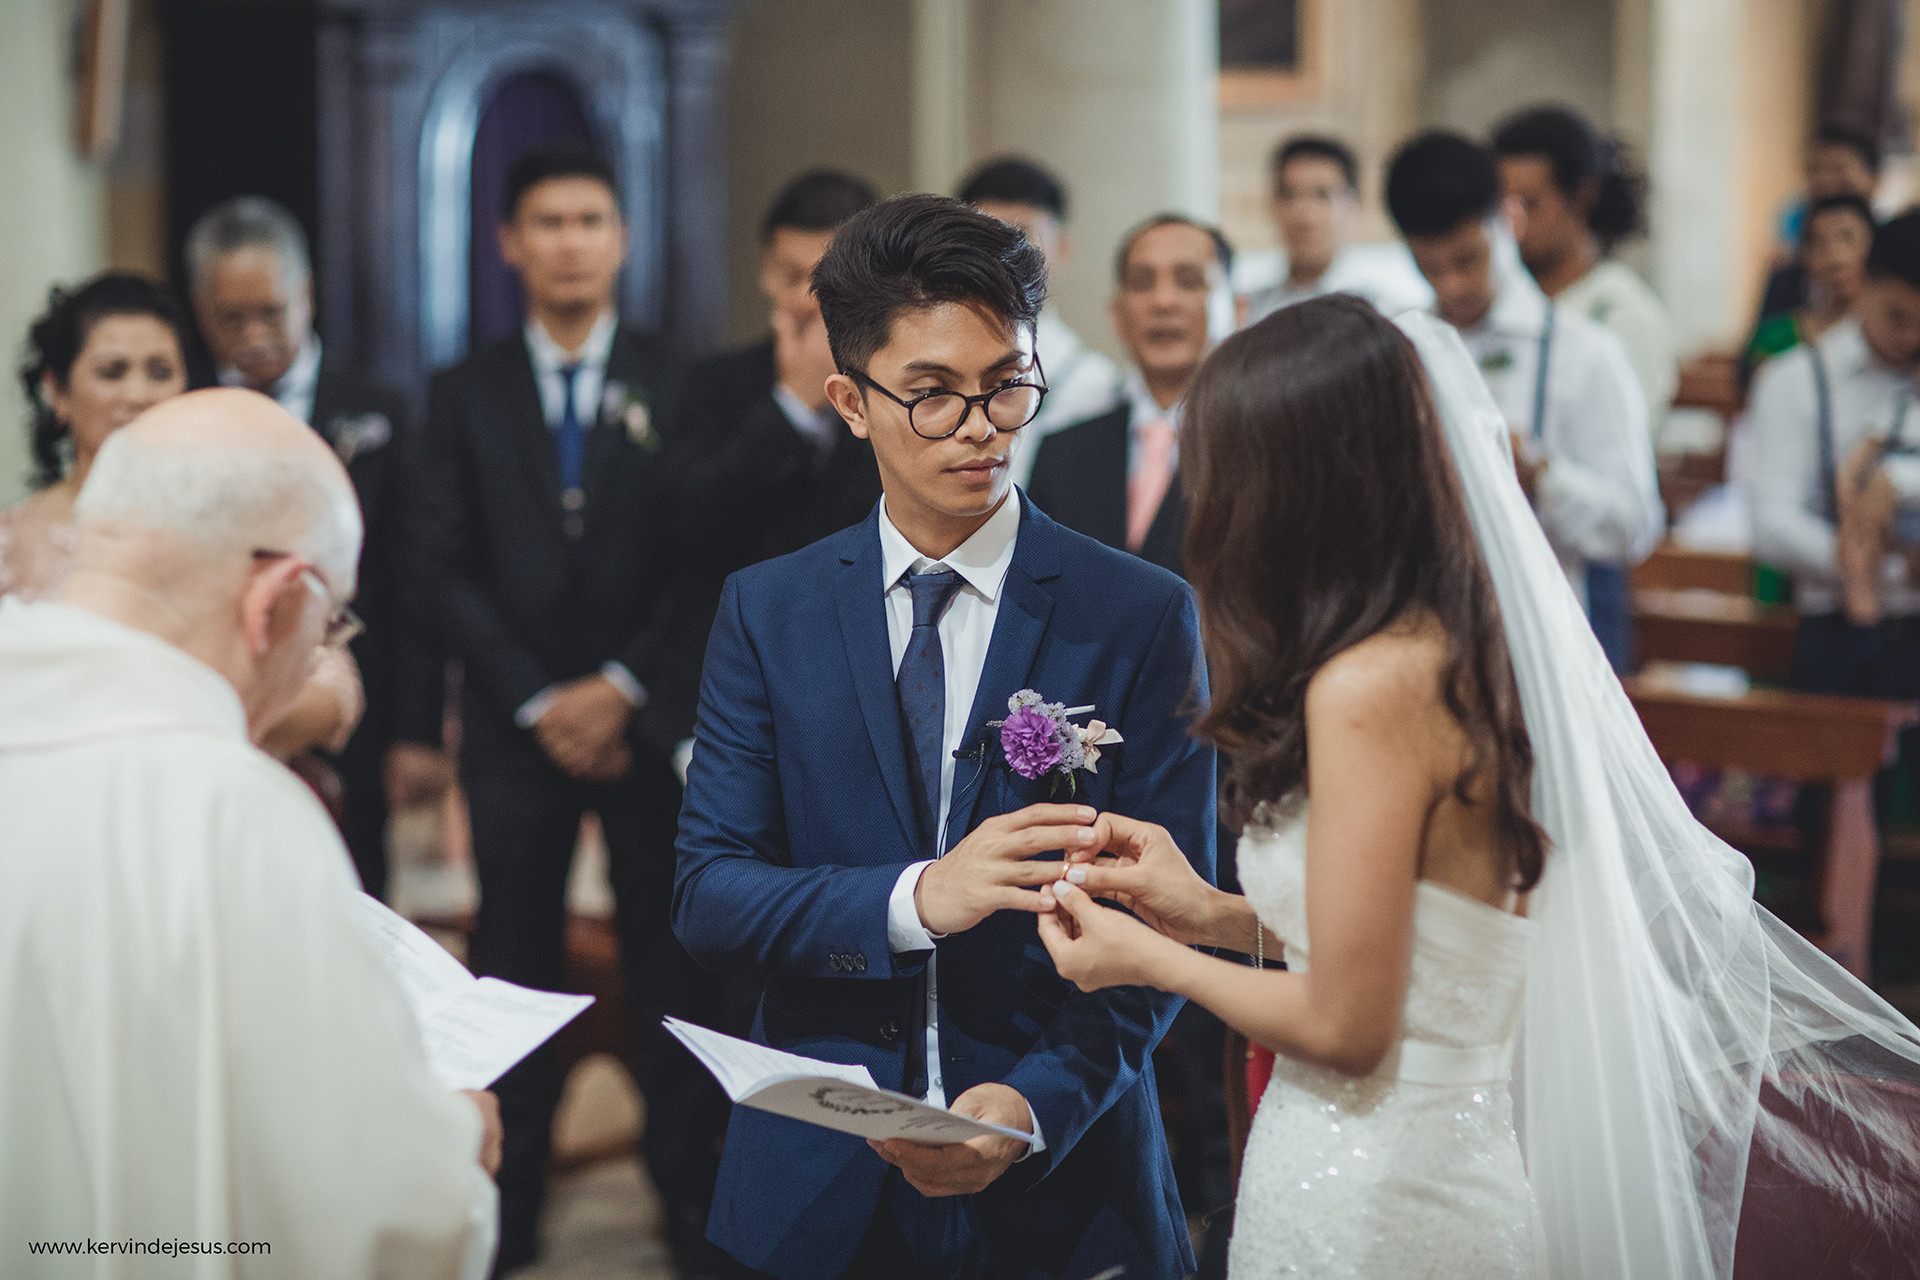 fcs_yovannenorman_wedding3.jpg